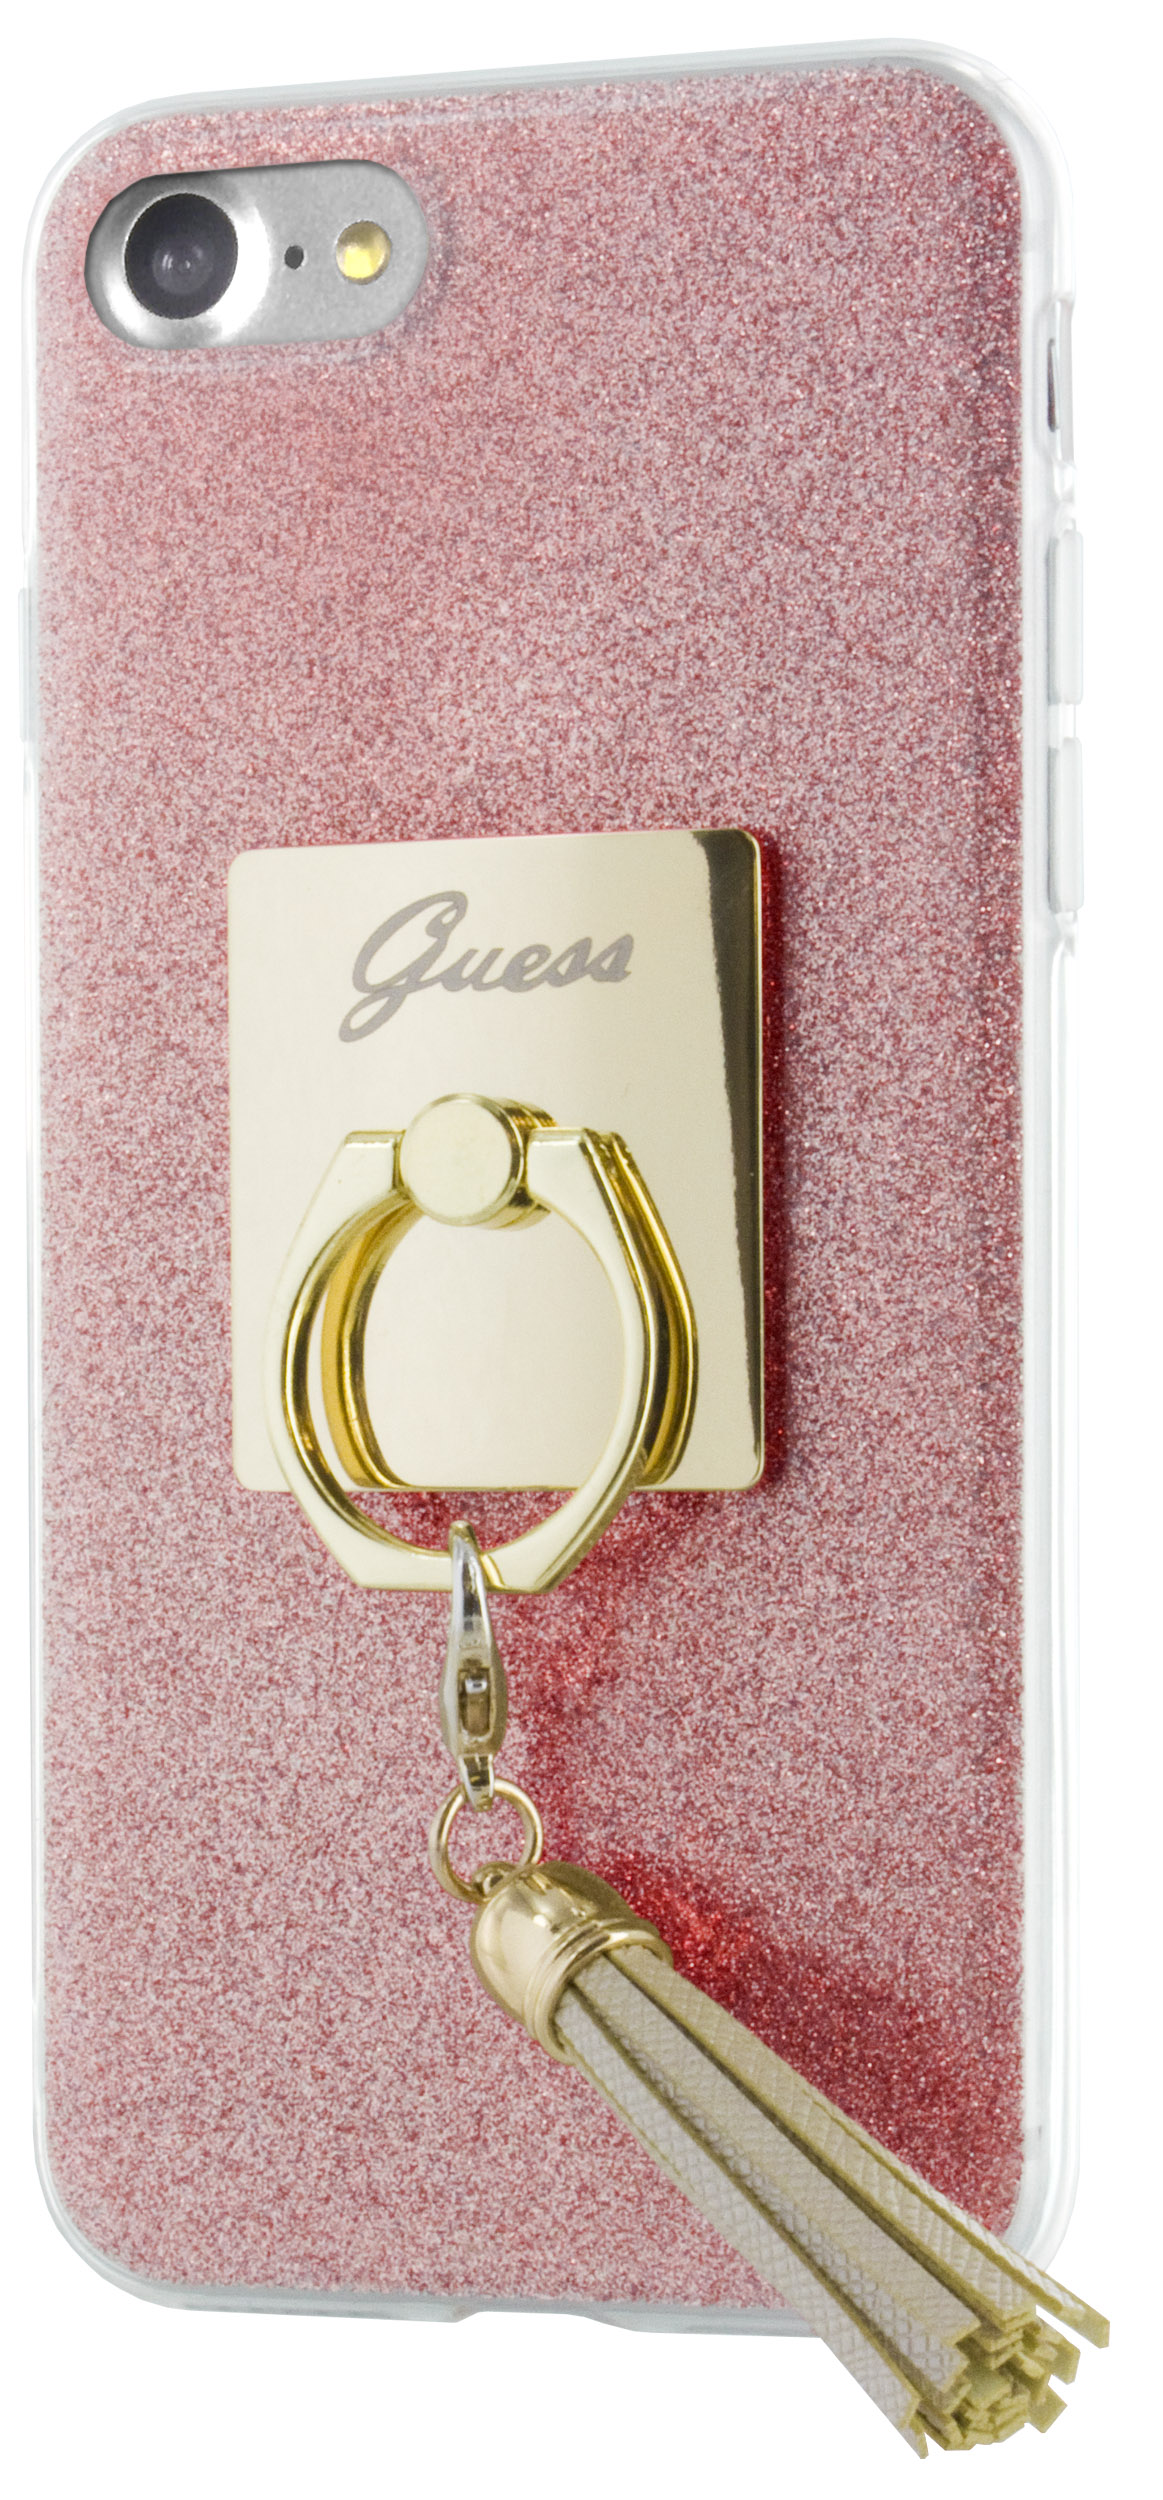 Guess Ring GUHCP7PRSRG silikonové pouzdro pro Apple iPhone 7 Plus Pink